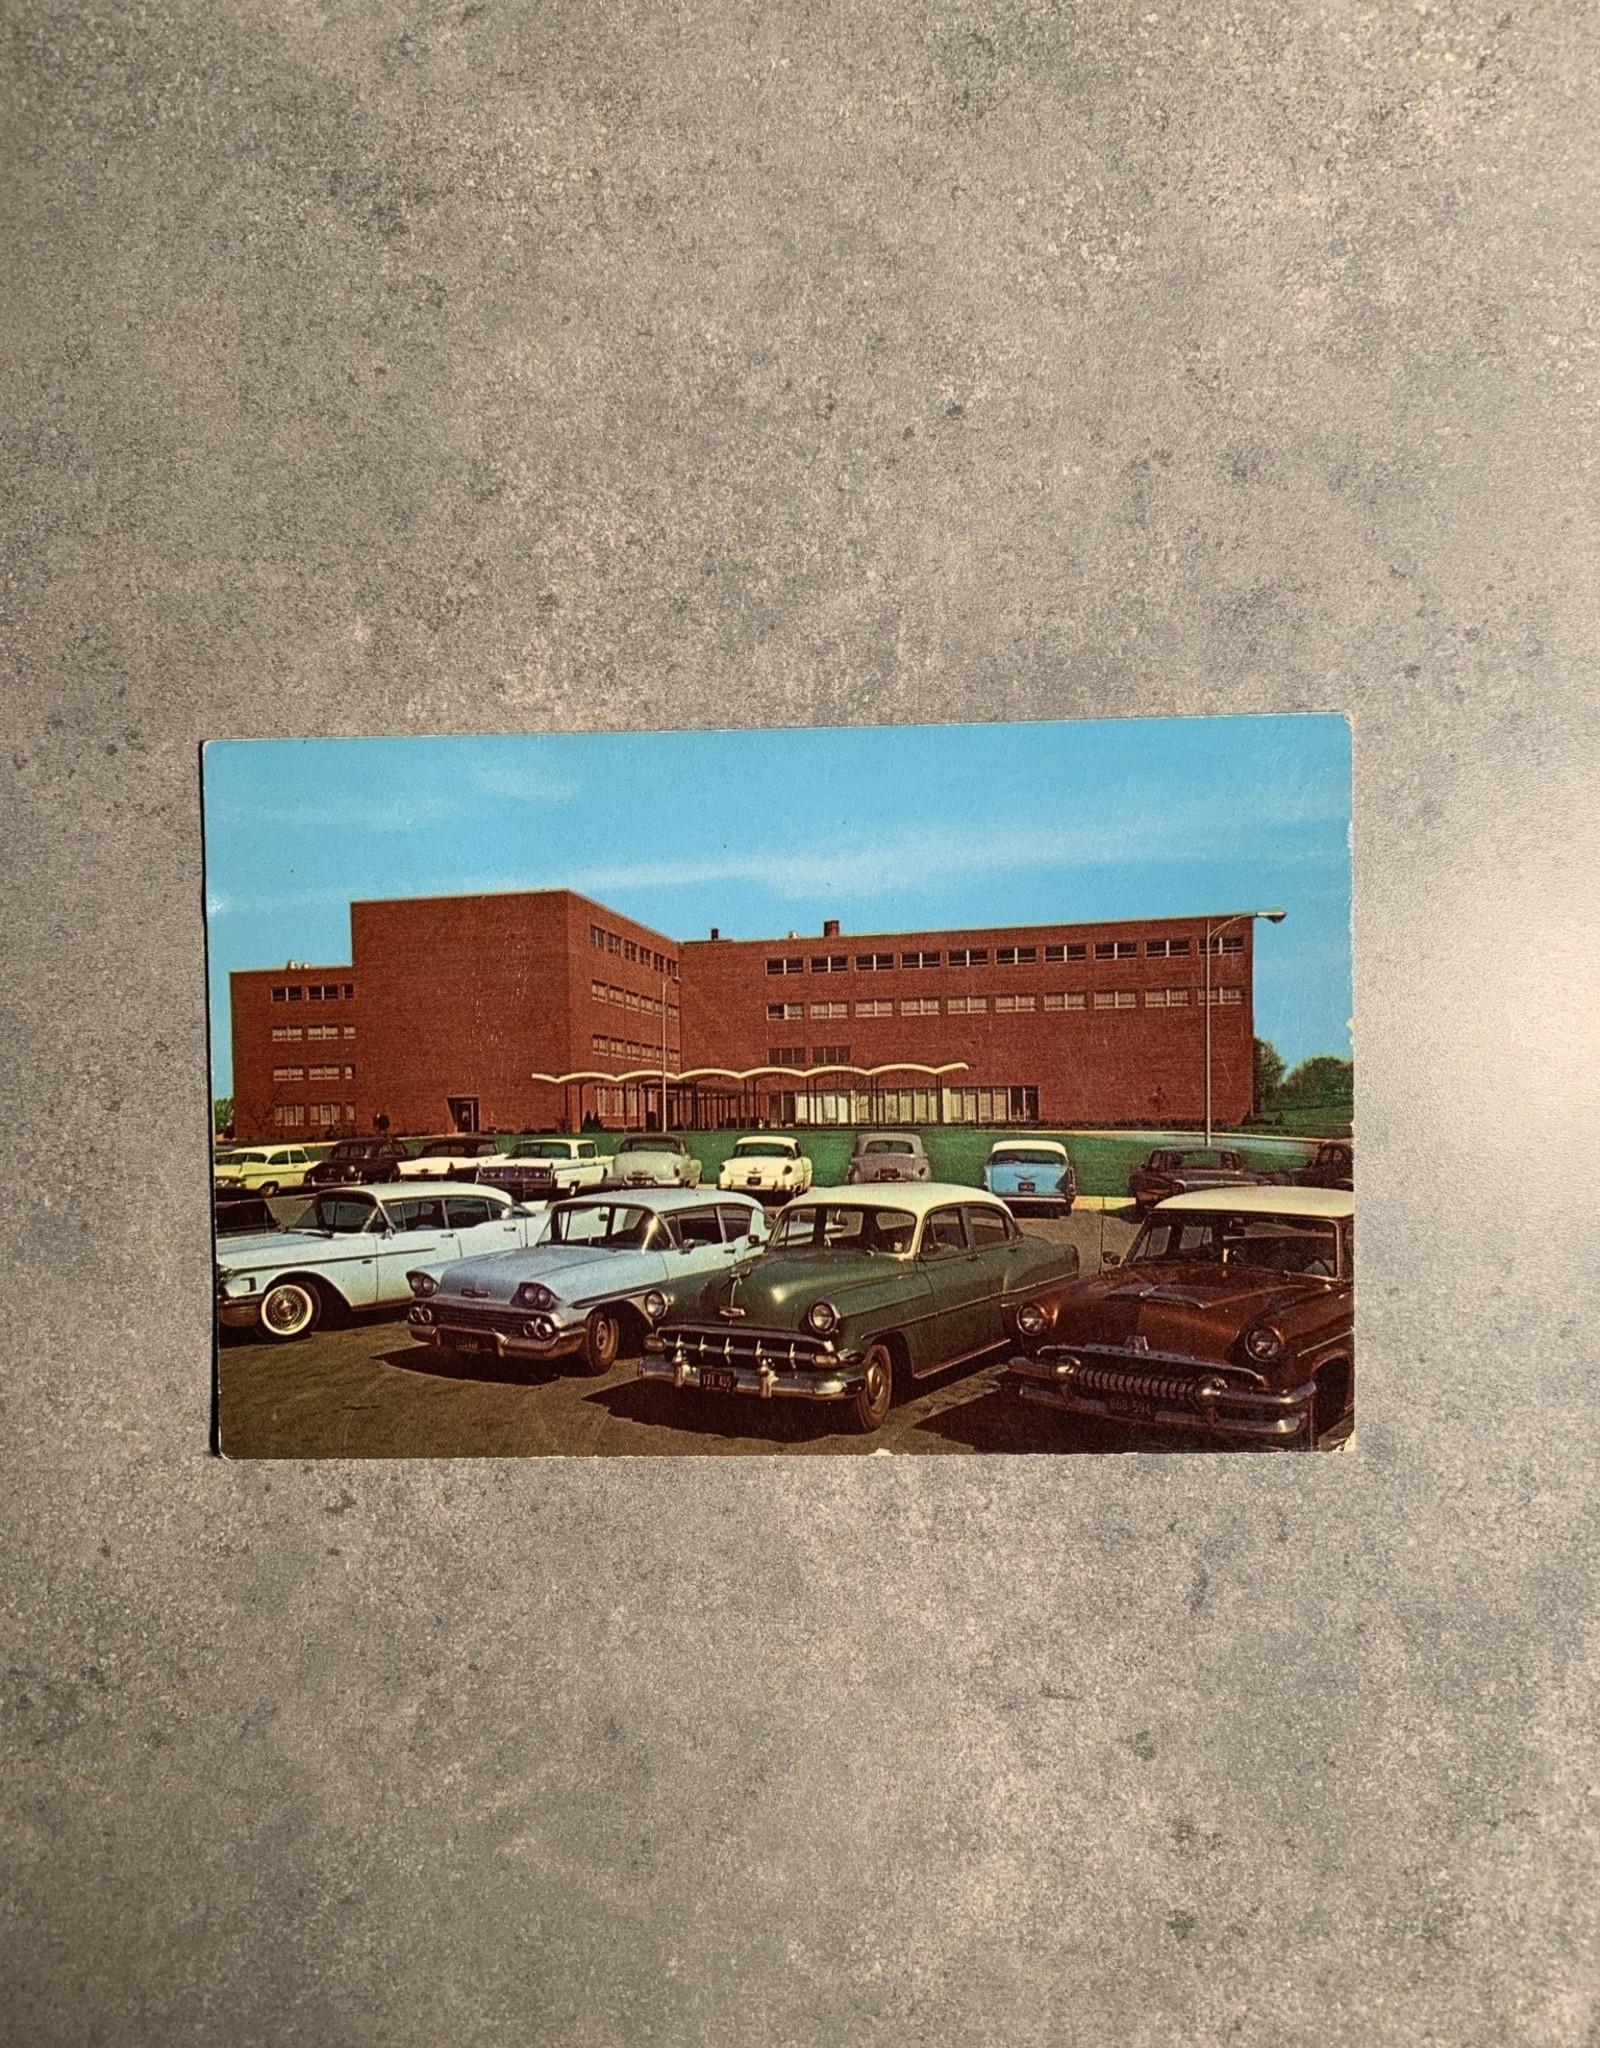 UA Merch Proctor Hospital Peoria Postcard